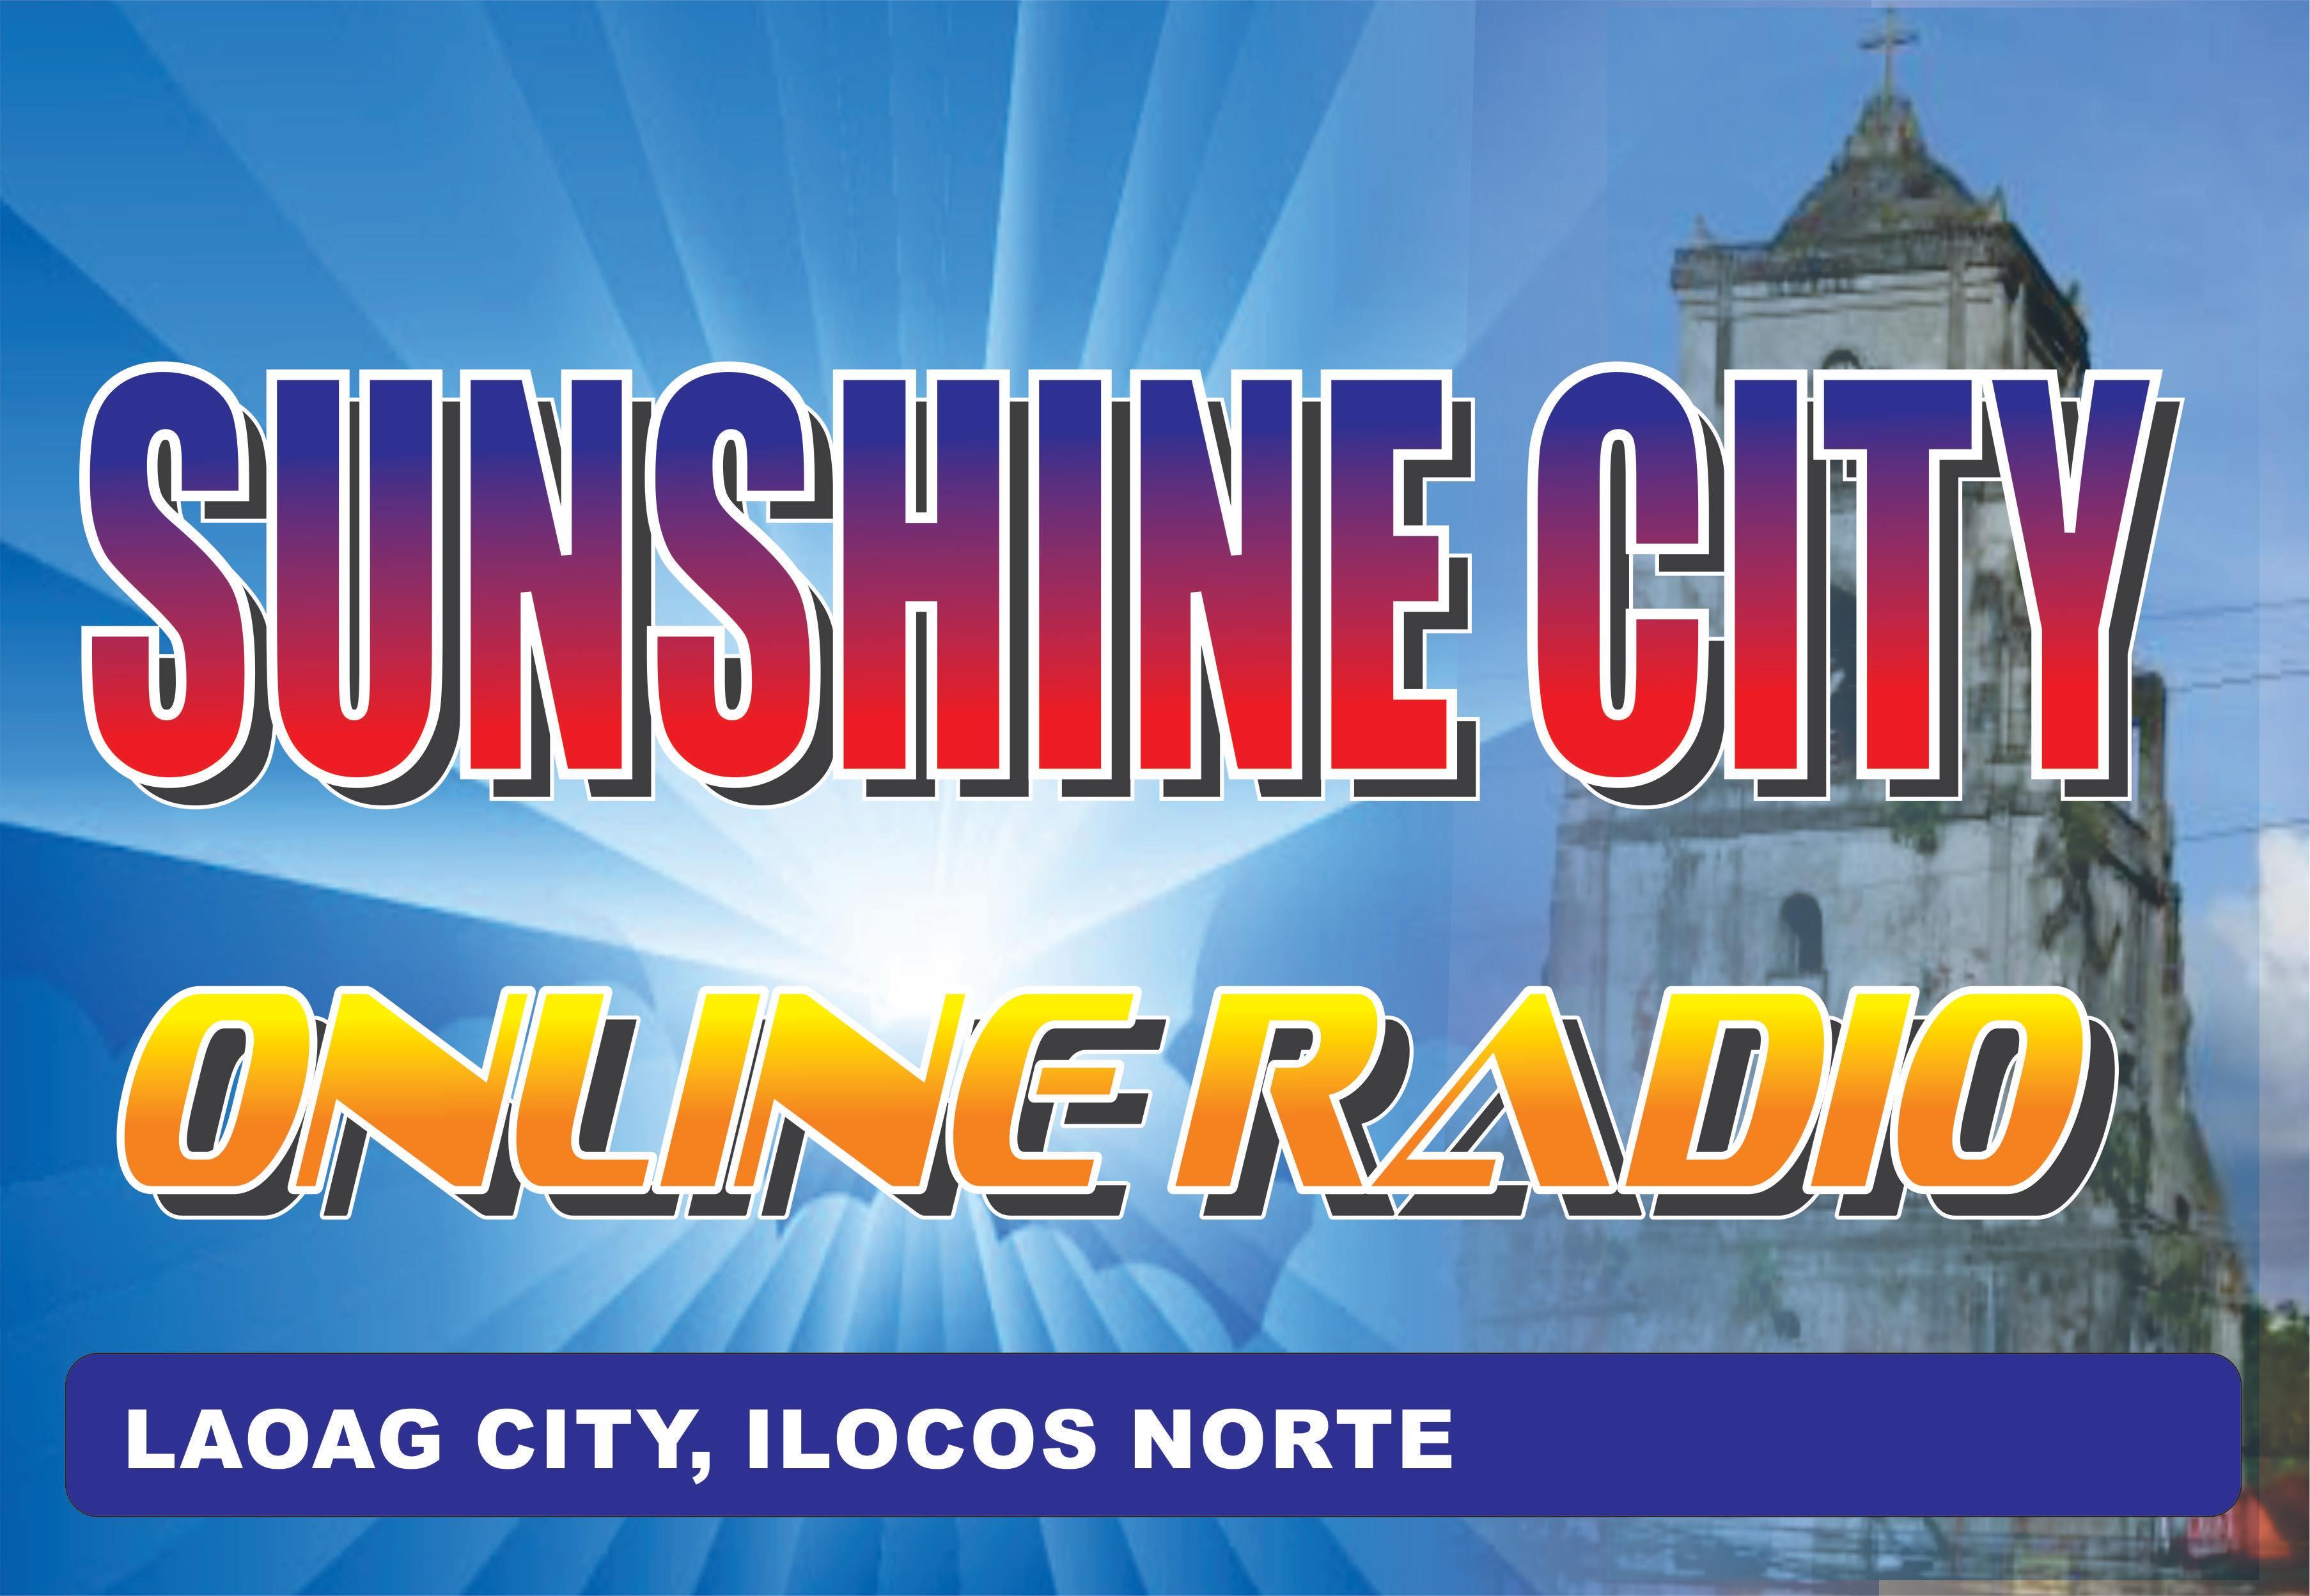 SUNSHINE CITY ONLINE RADIO PHILIPPINES